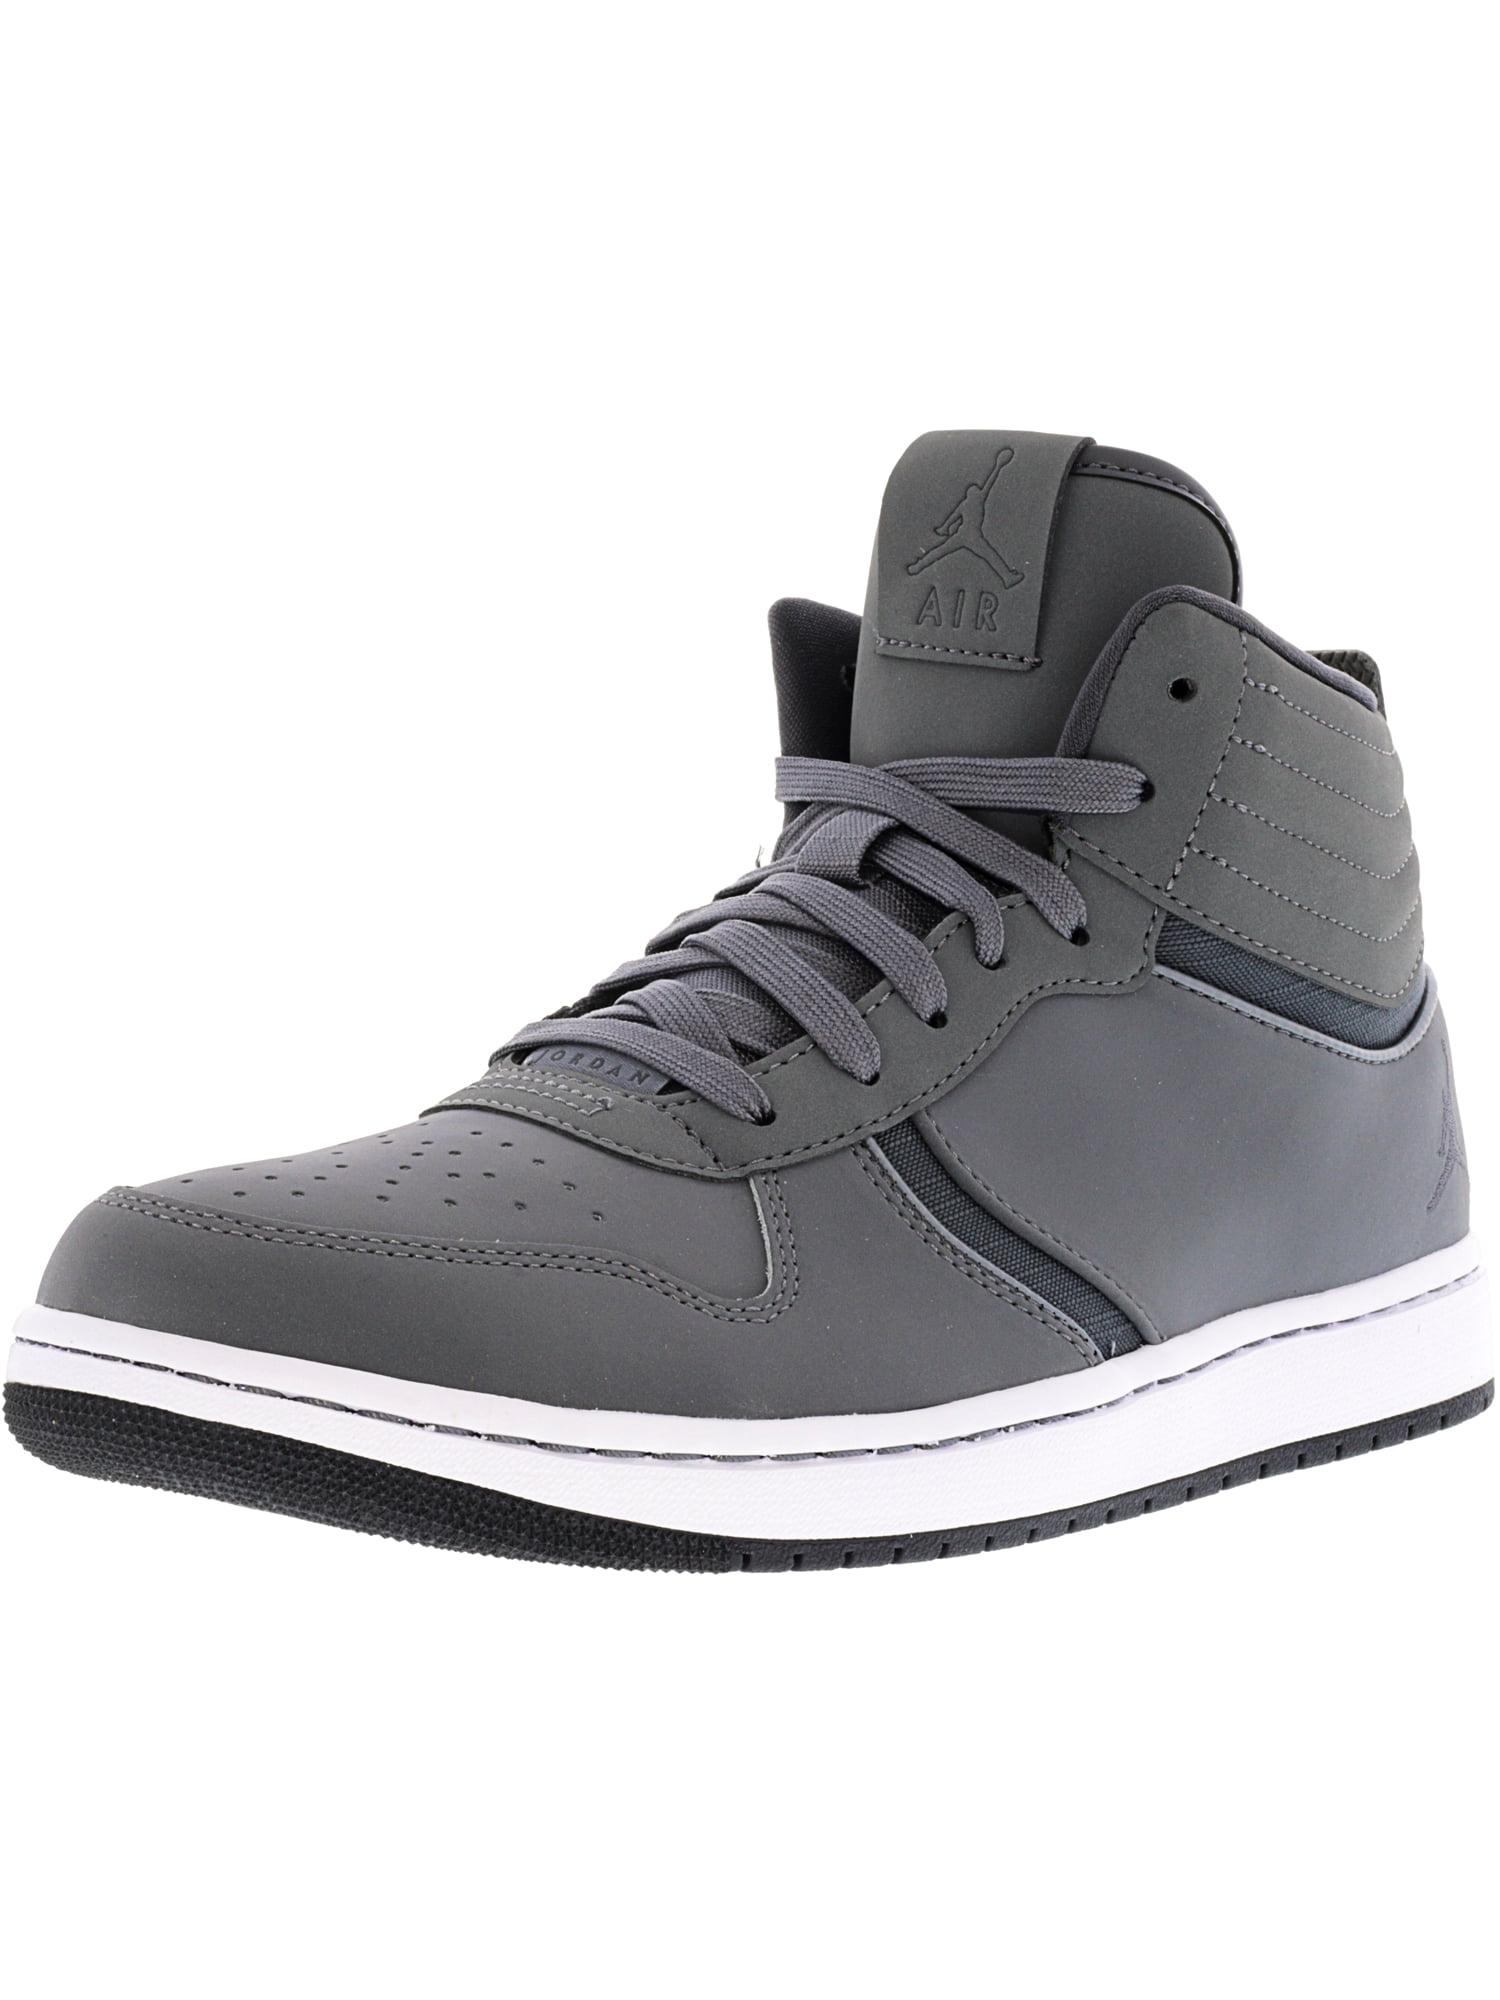 Nike Men's Jordan Air Heritage Cool Grey / Dark Grey-Dark High-Top Fashion Sneaker - 10M